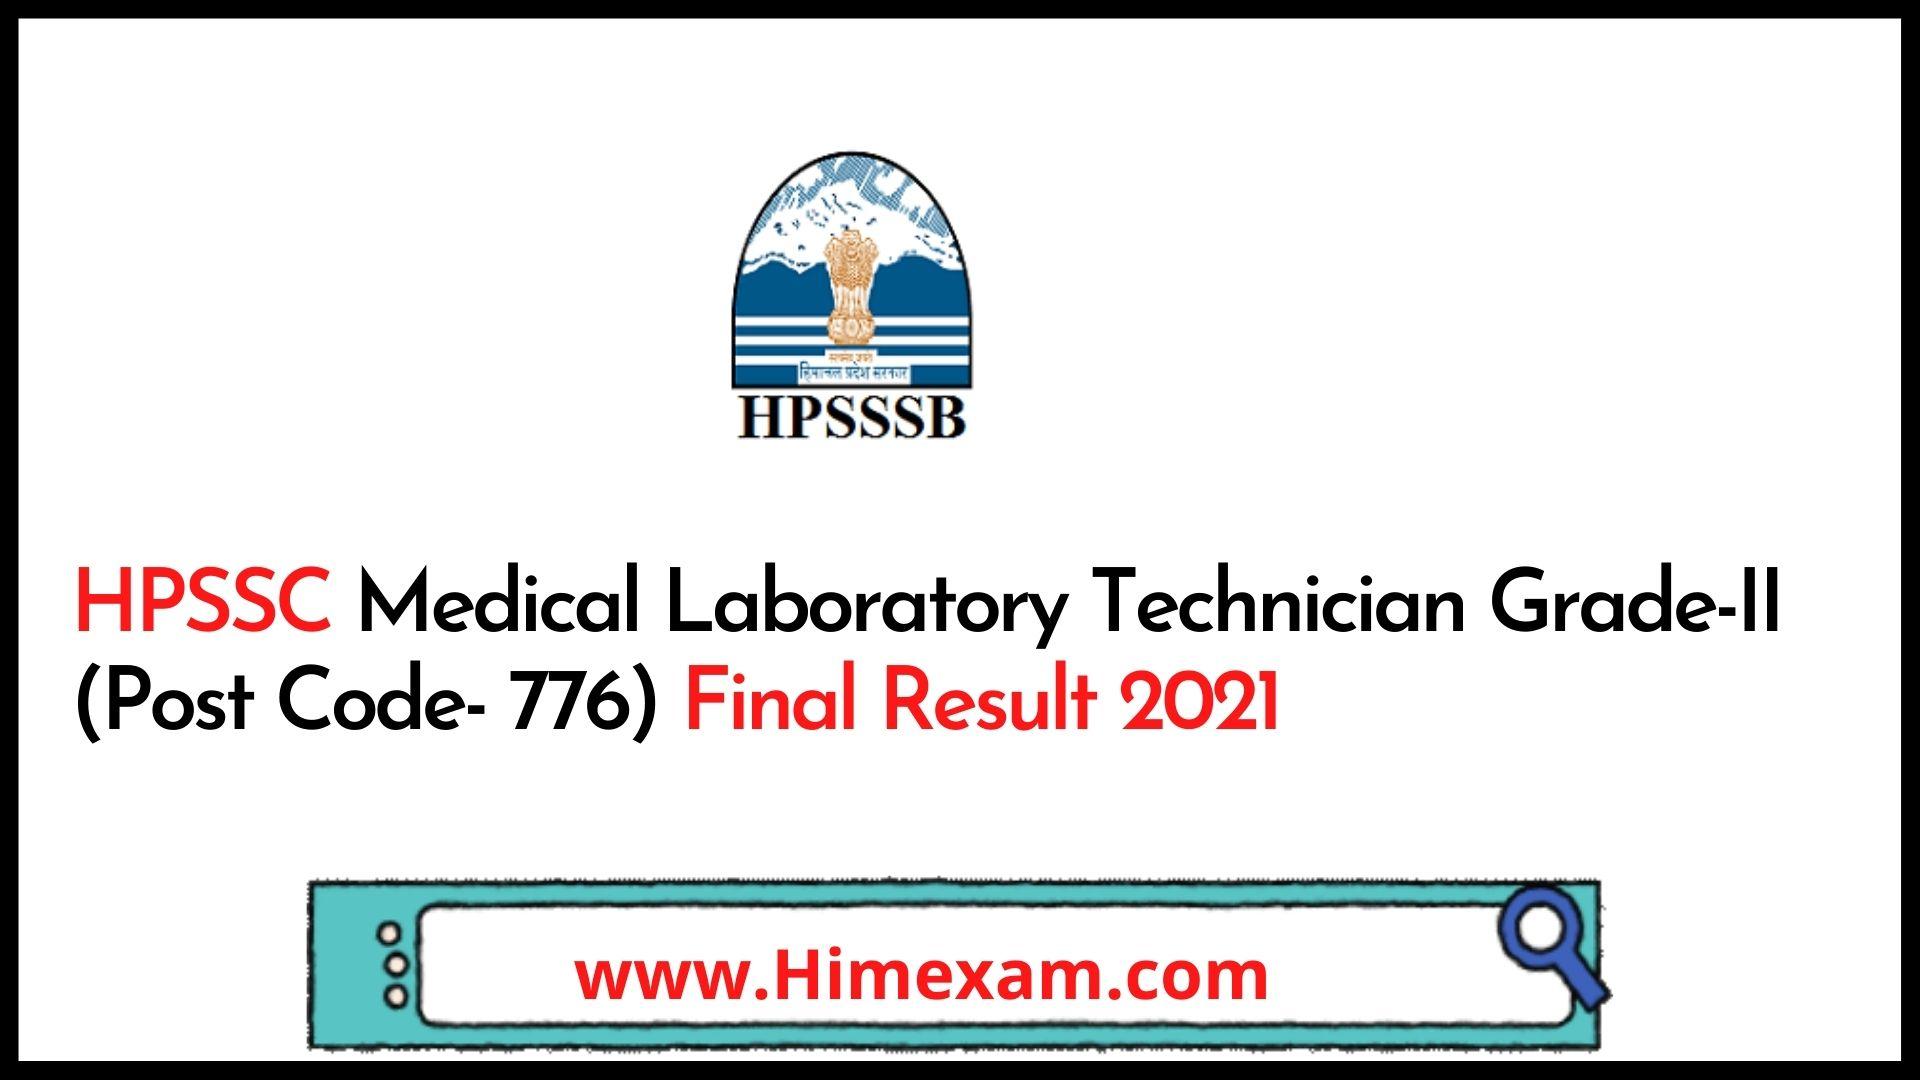 HPSSC Medical Laboratory Technician Grade-II (Post Code- 776) Final Result 2021